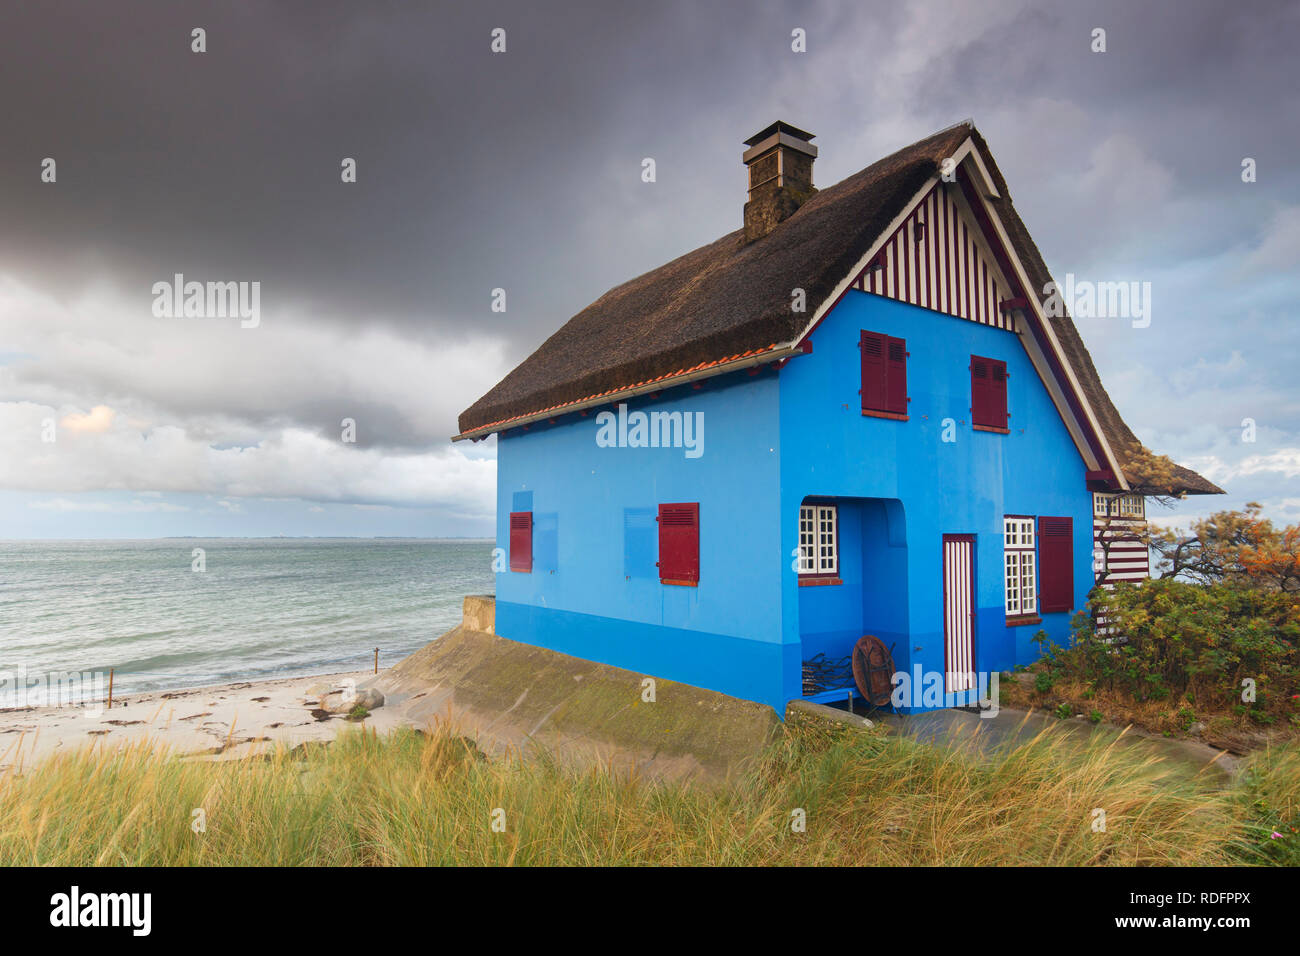 Blue beach house on the peninsula Graswarder, Heiligenhafen, Schleswig-Holstein, Germany Stock Photo